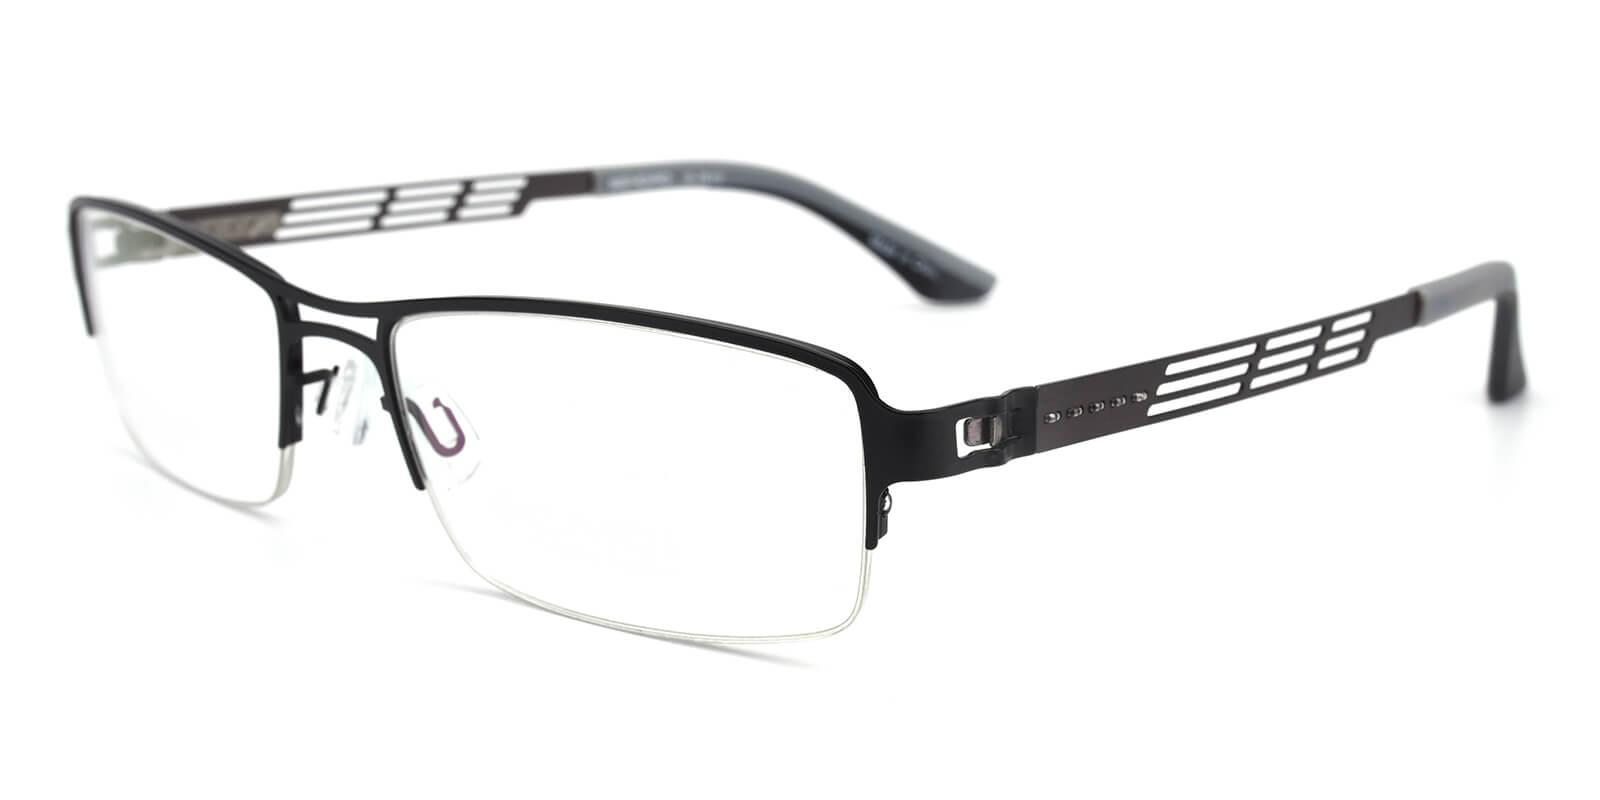 Carel-Gray-Rectangle-Metal-Eyeglasses-detail